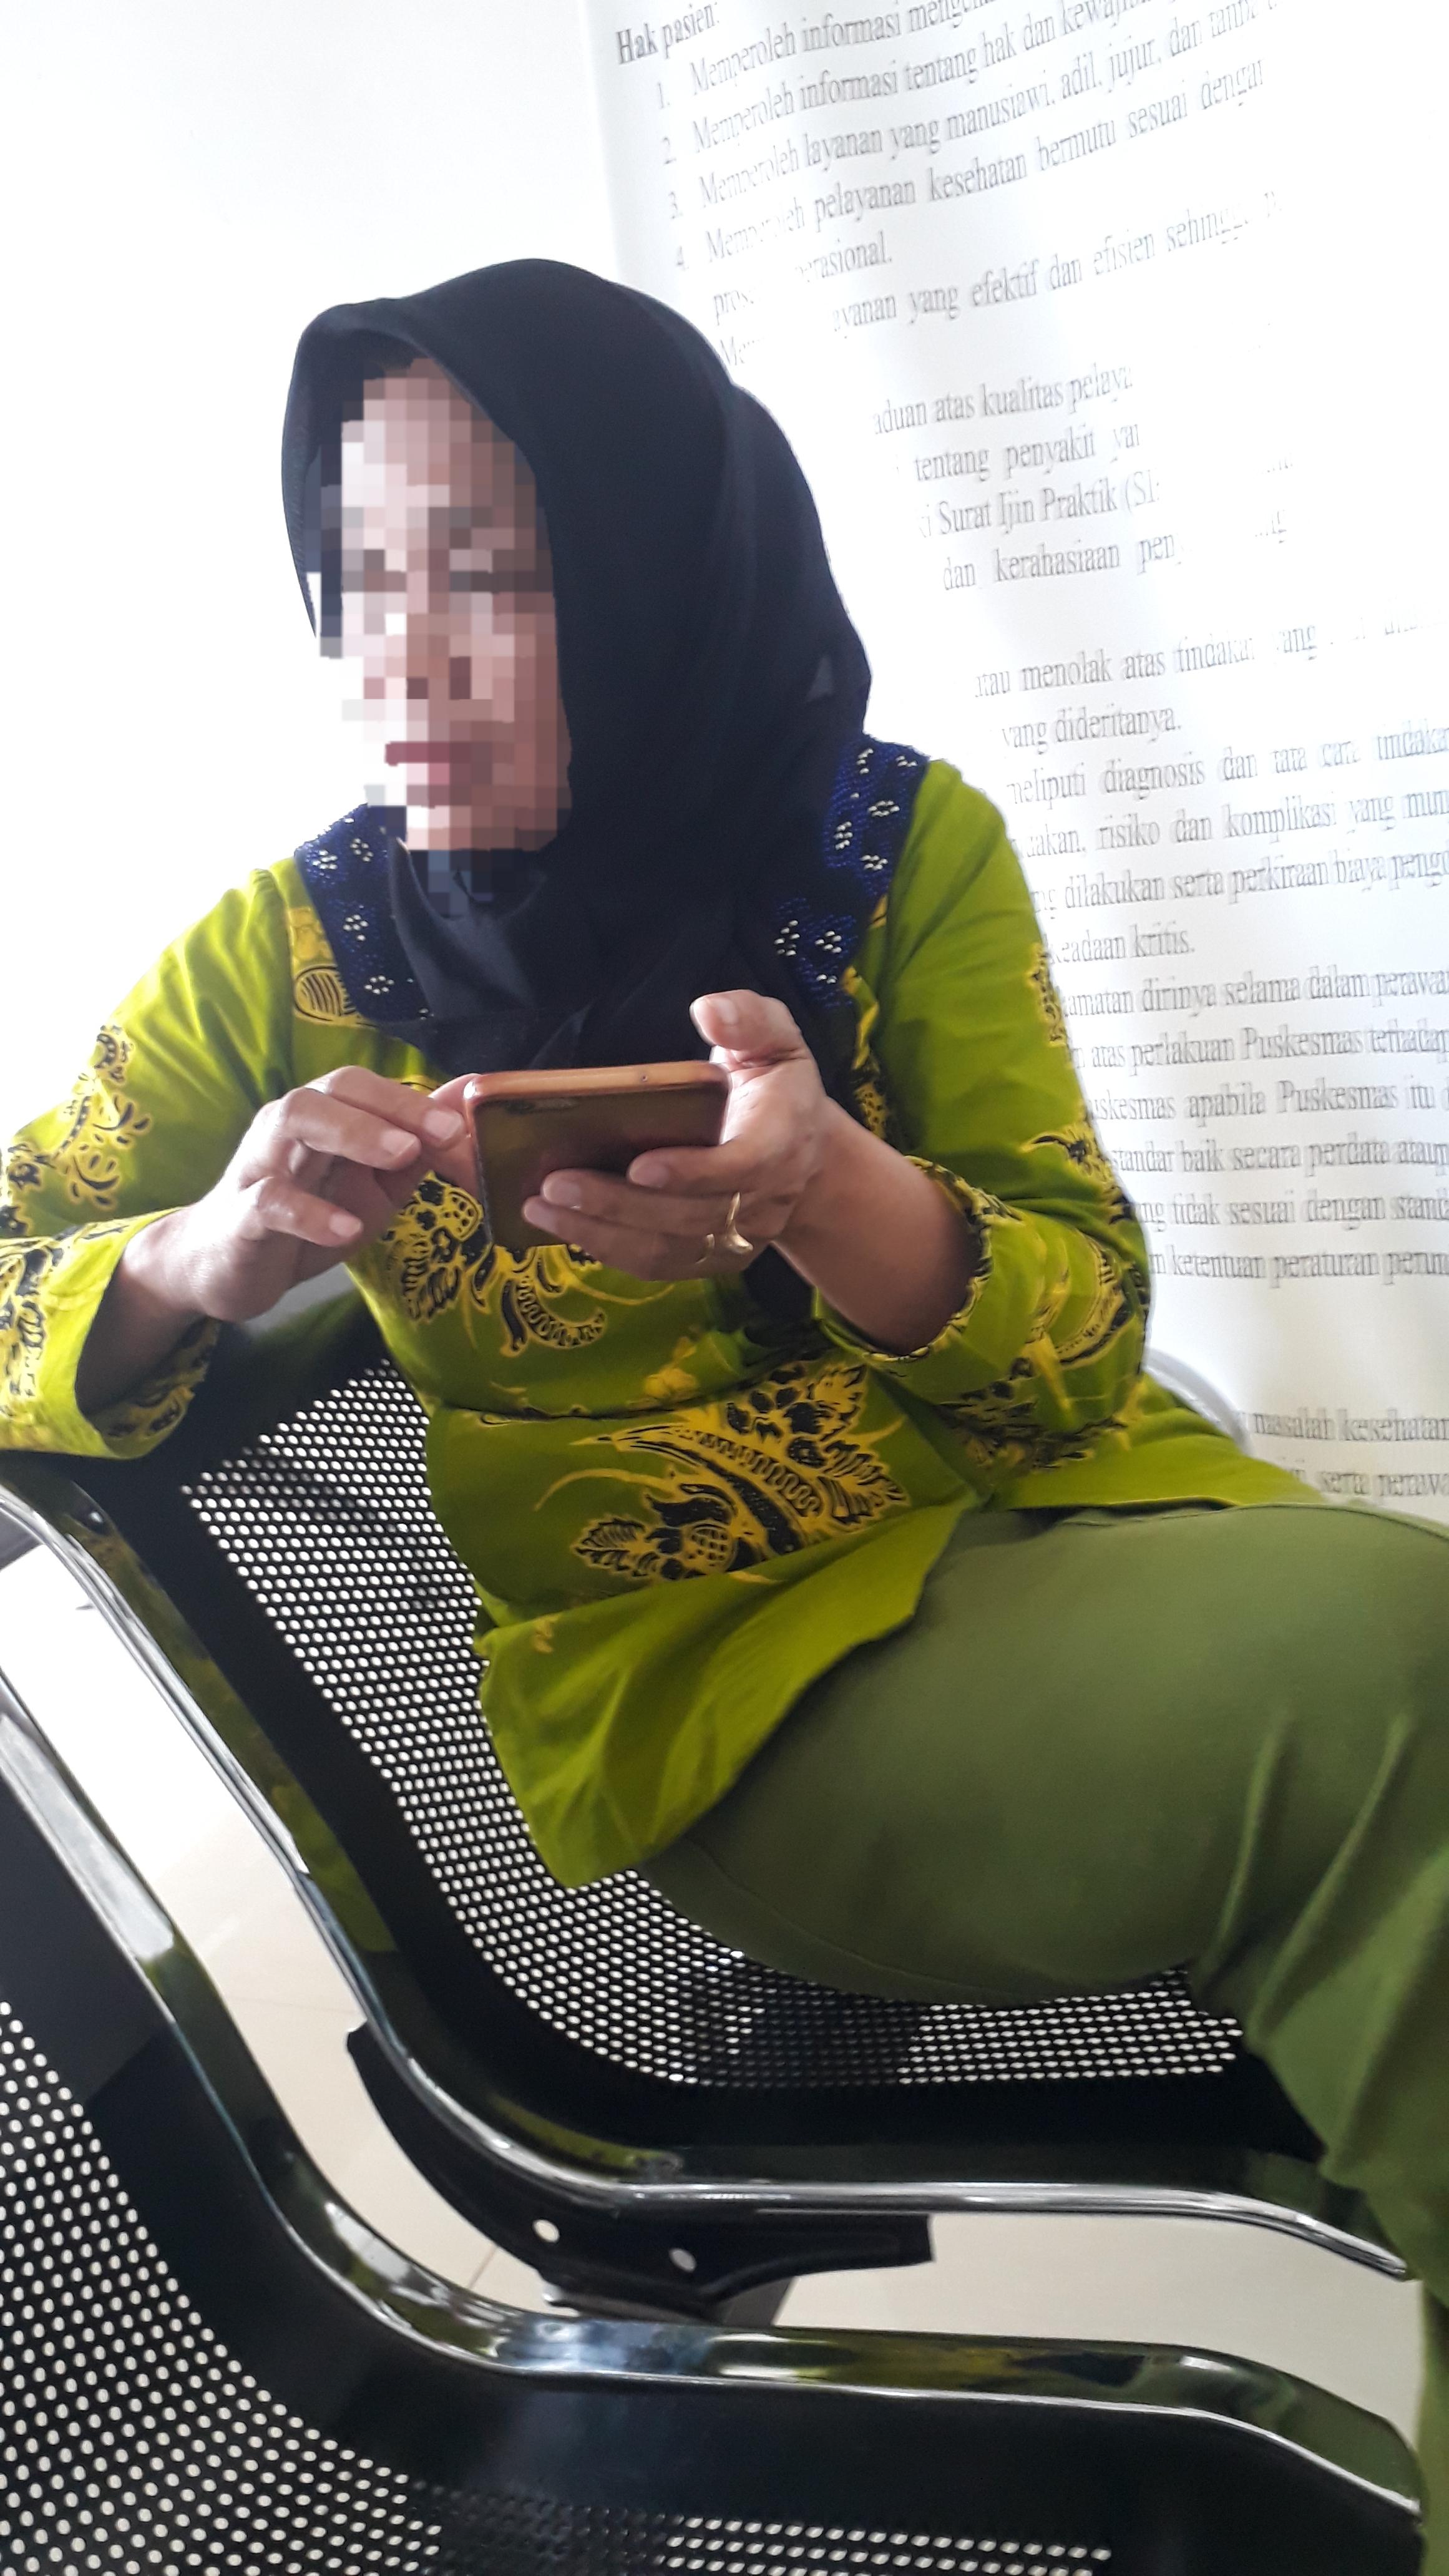 Oknum Bidan Yang diduga Langgar SOP Persalinan ternyata Istri Kades Purwoharjo